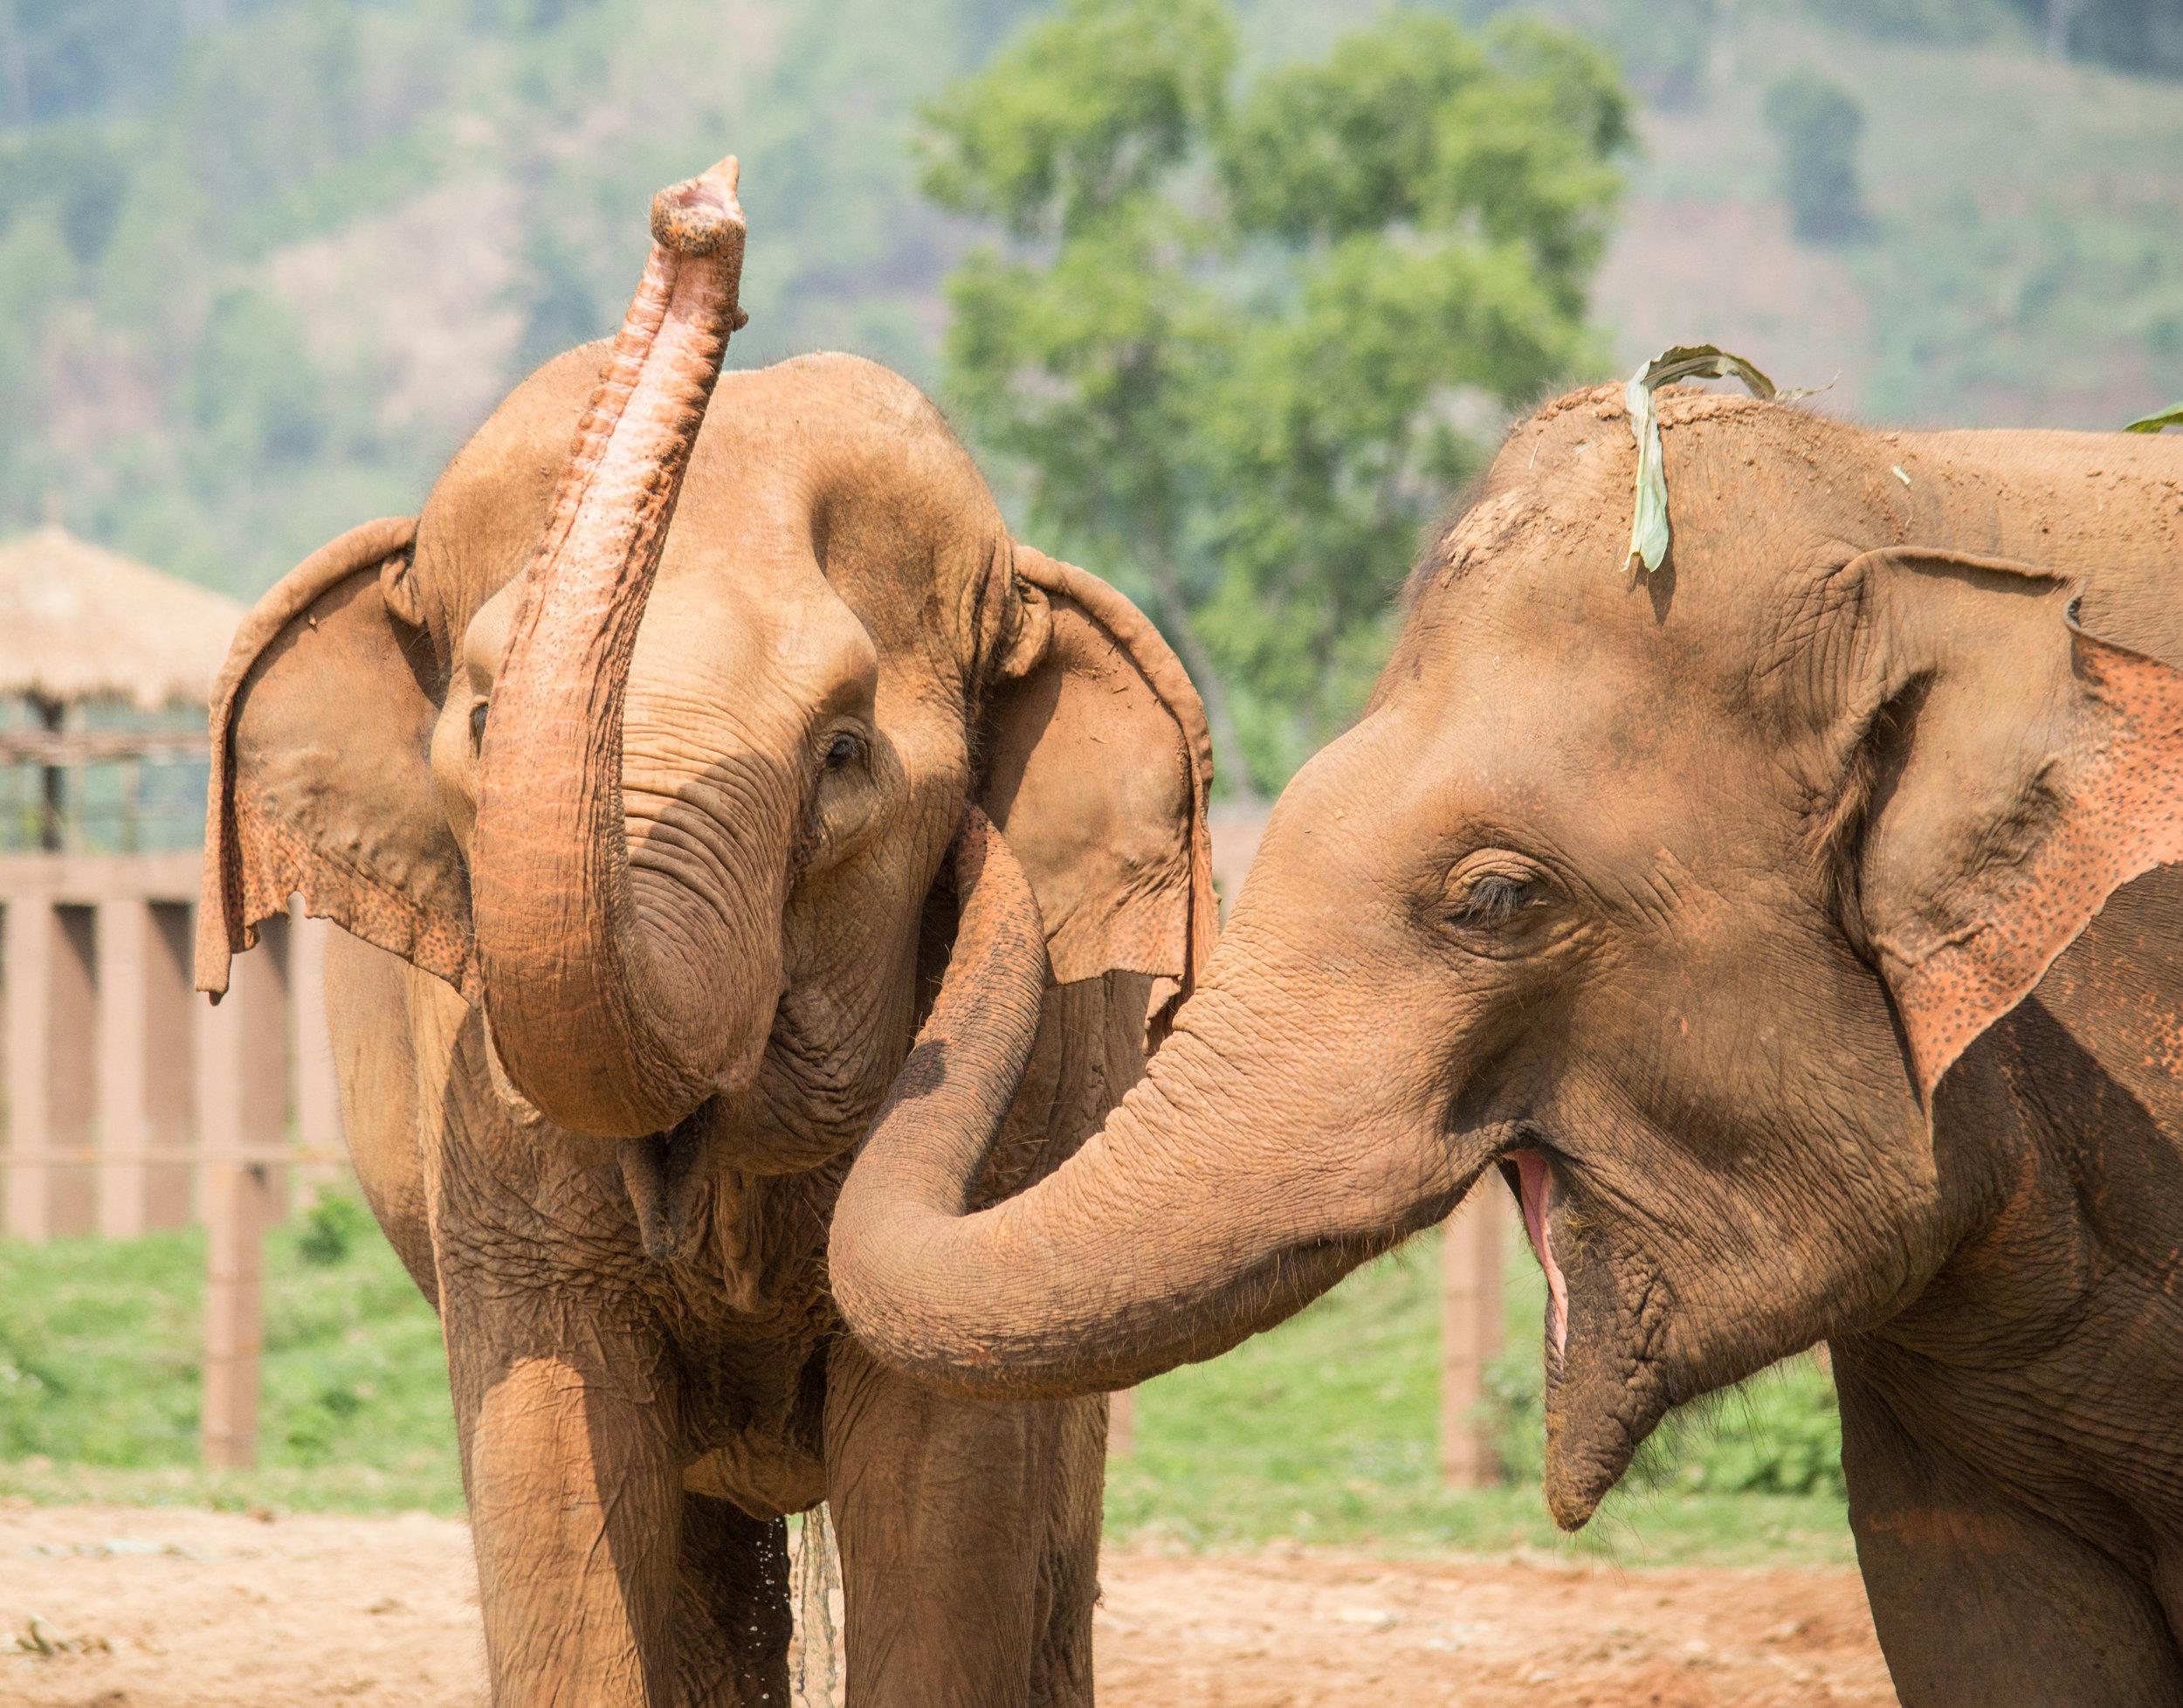 Photo by Karoline Hood. Rescued elephants at Elephant Nature Park